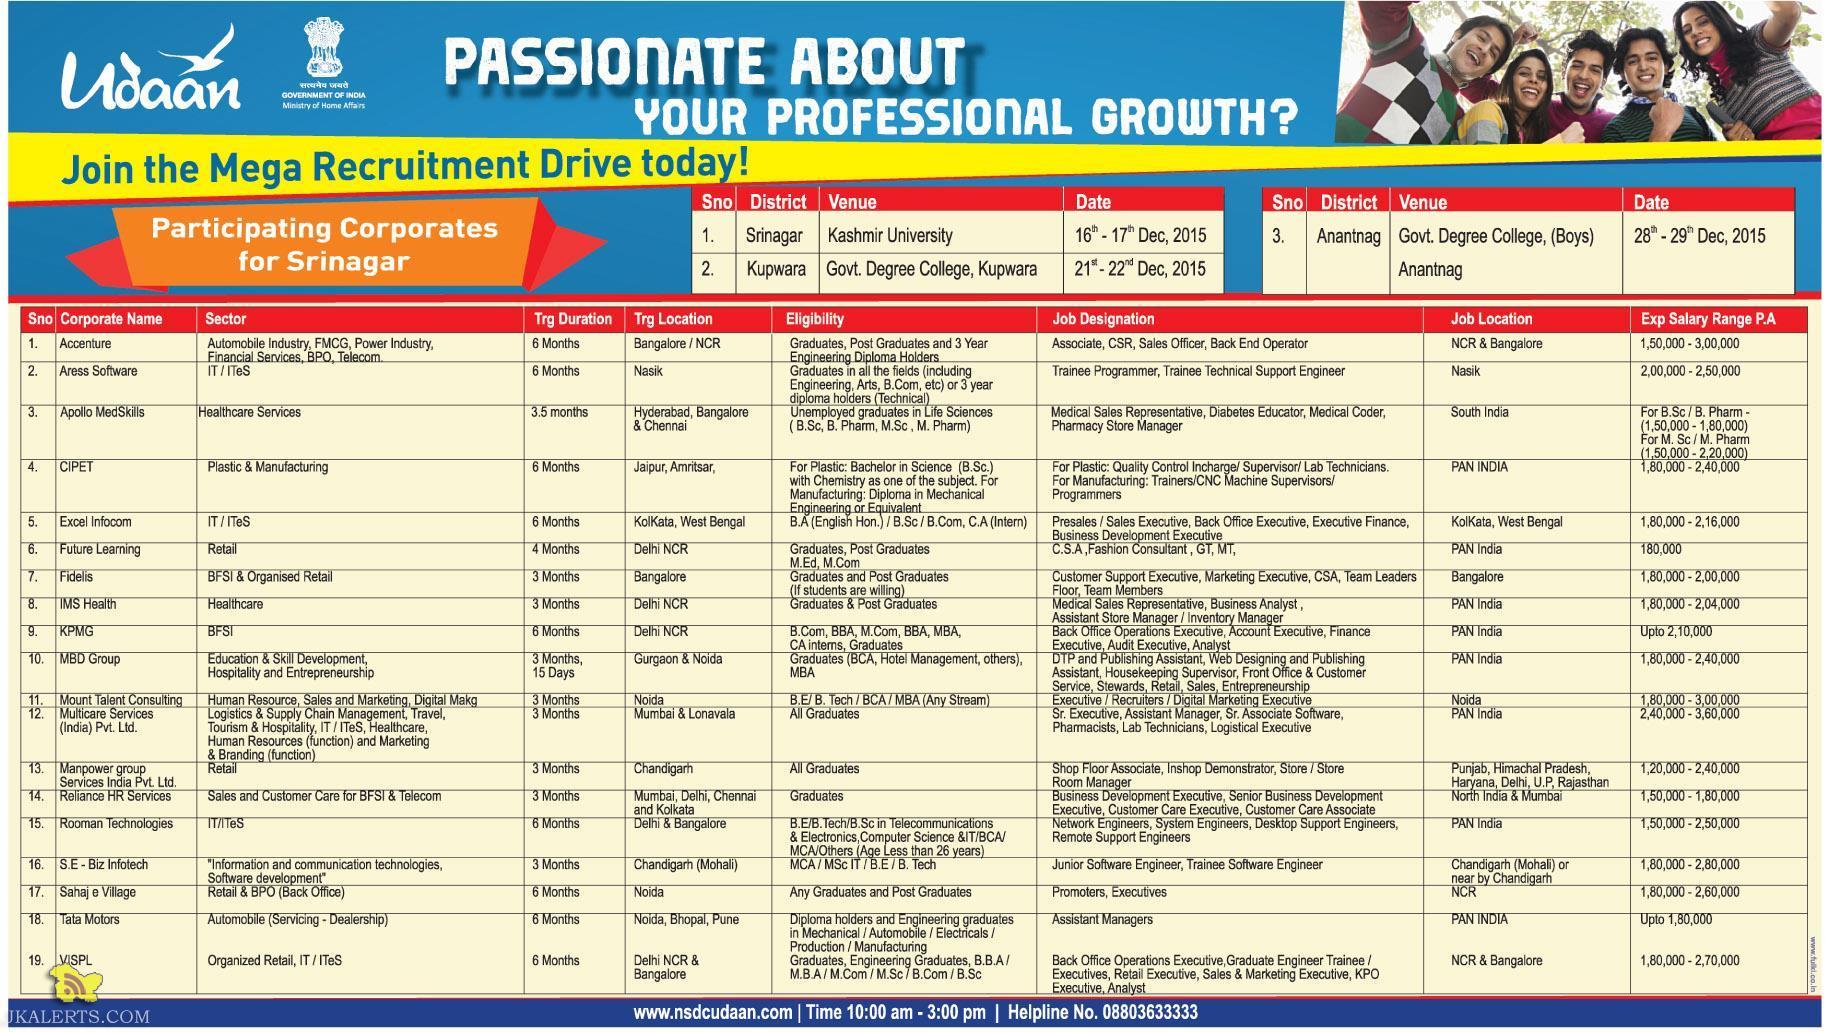 Udaan Recruitment Drive Kupwara, Srinagar Anantnag